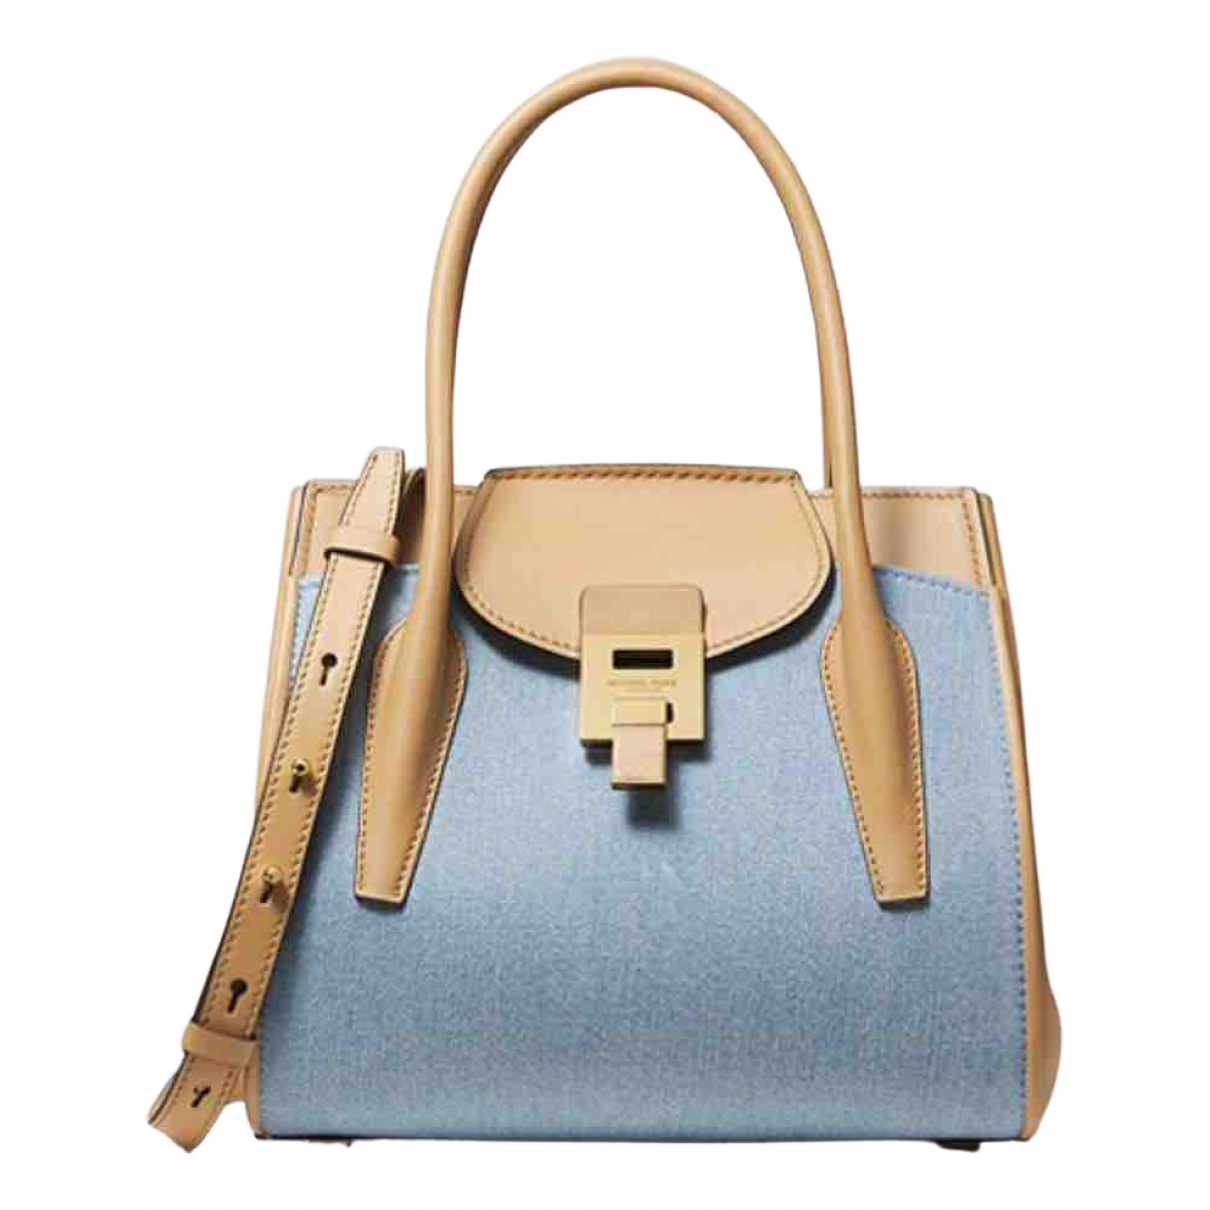 Michael Kors Bancroft (Collection) Leather handbag for Women \N